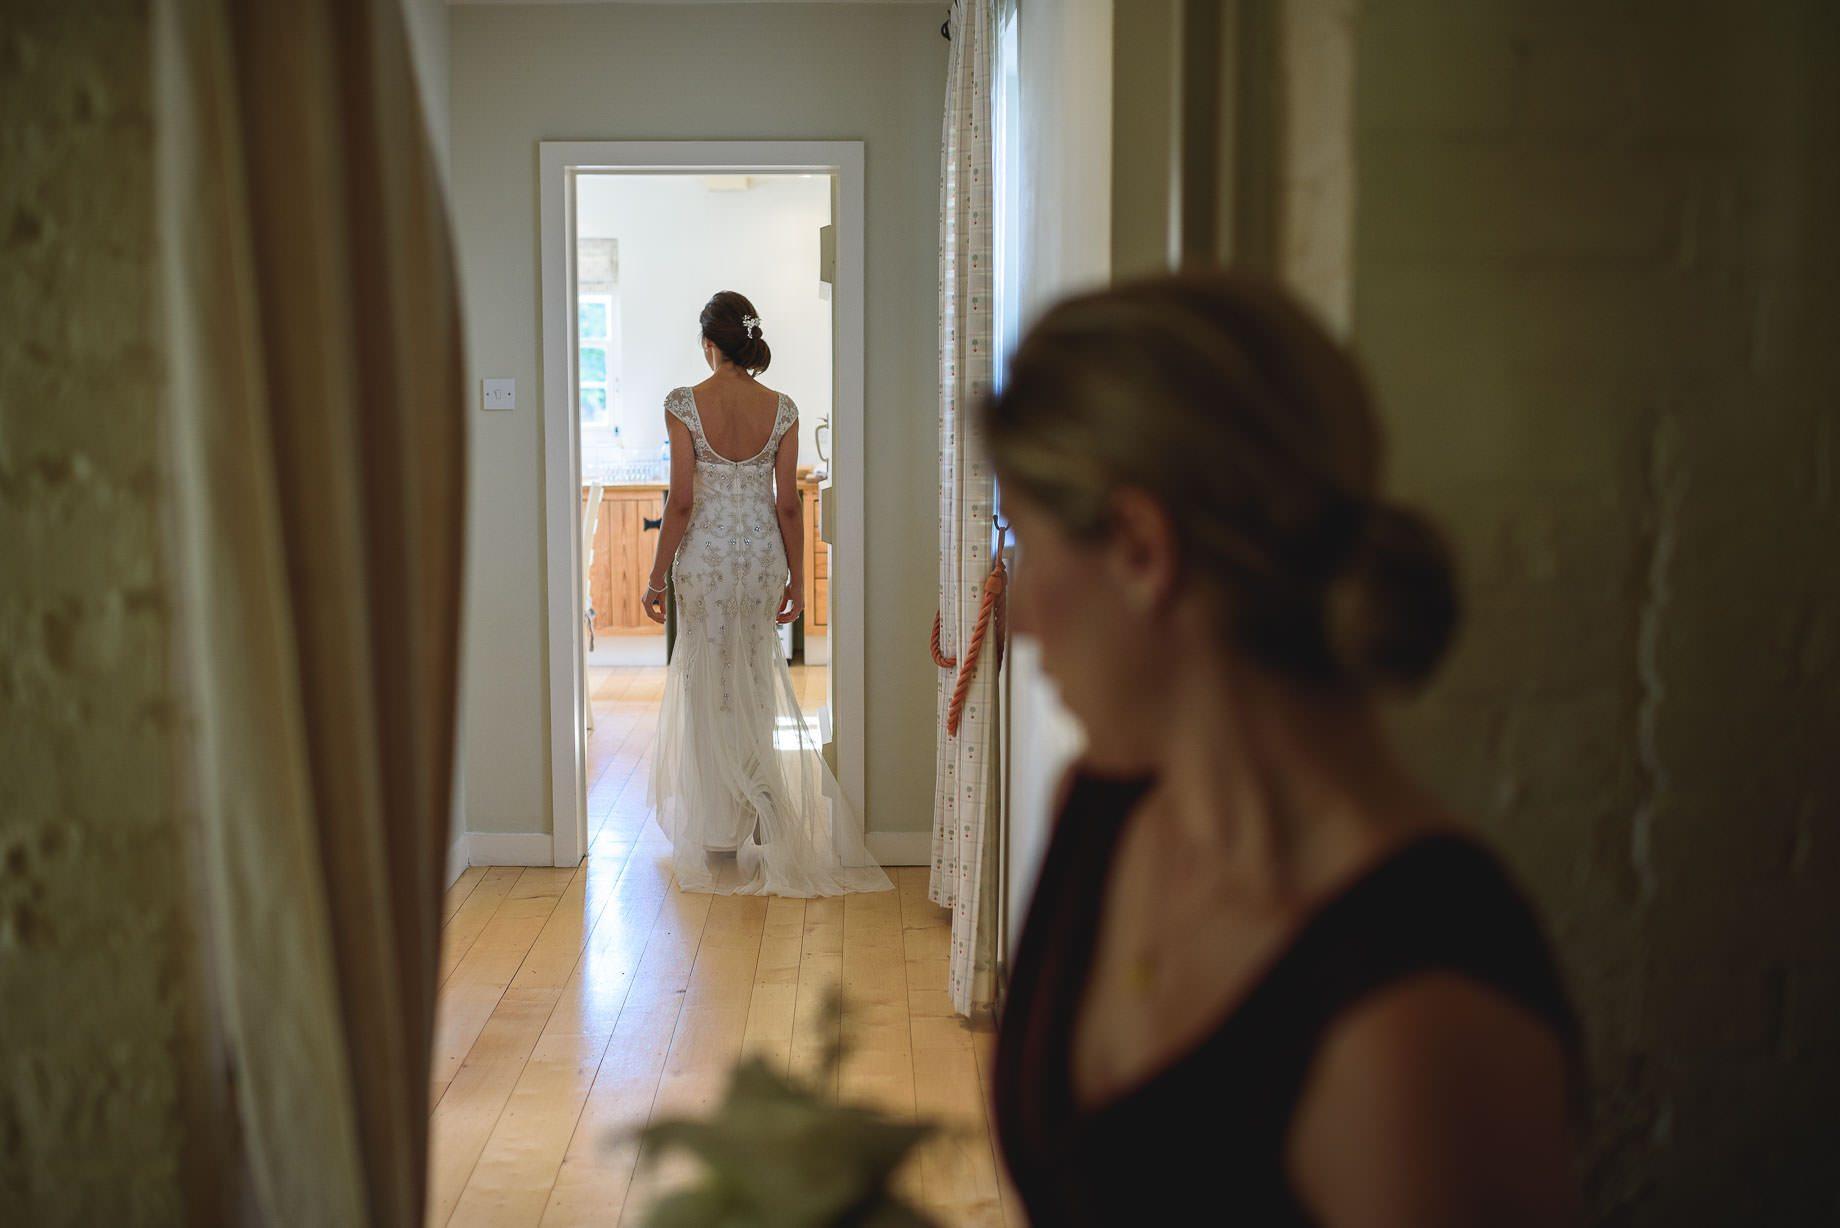 bury-court-barn-wedding-photography-guy-collier-photography-nadia-tom-41-of-184